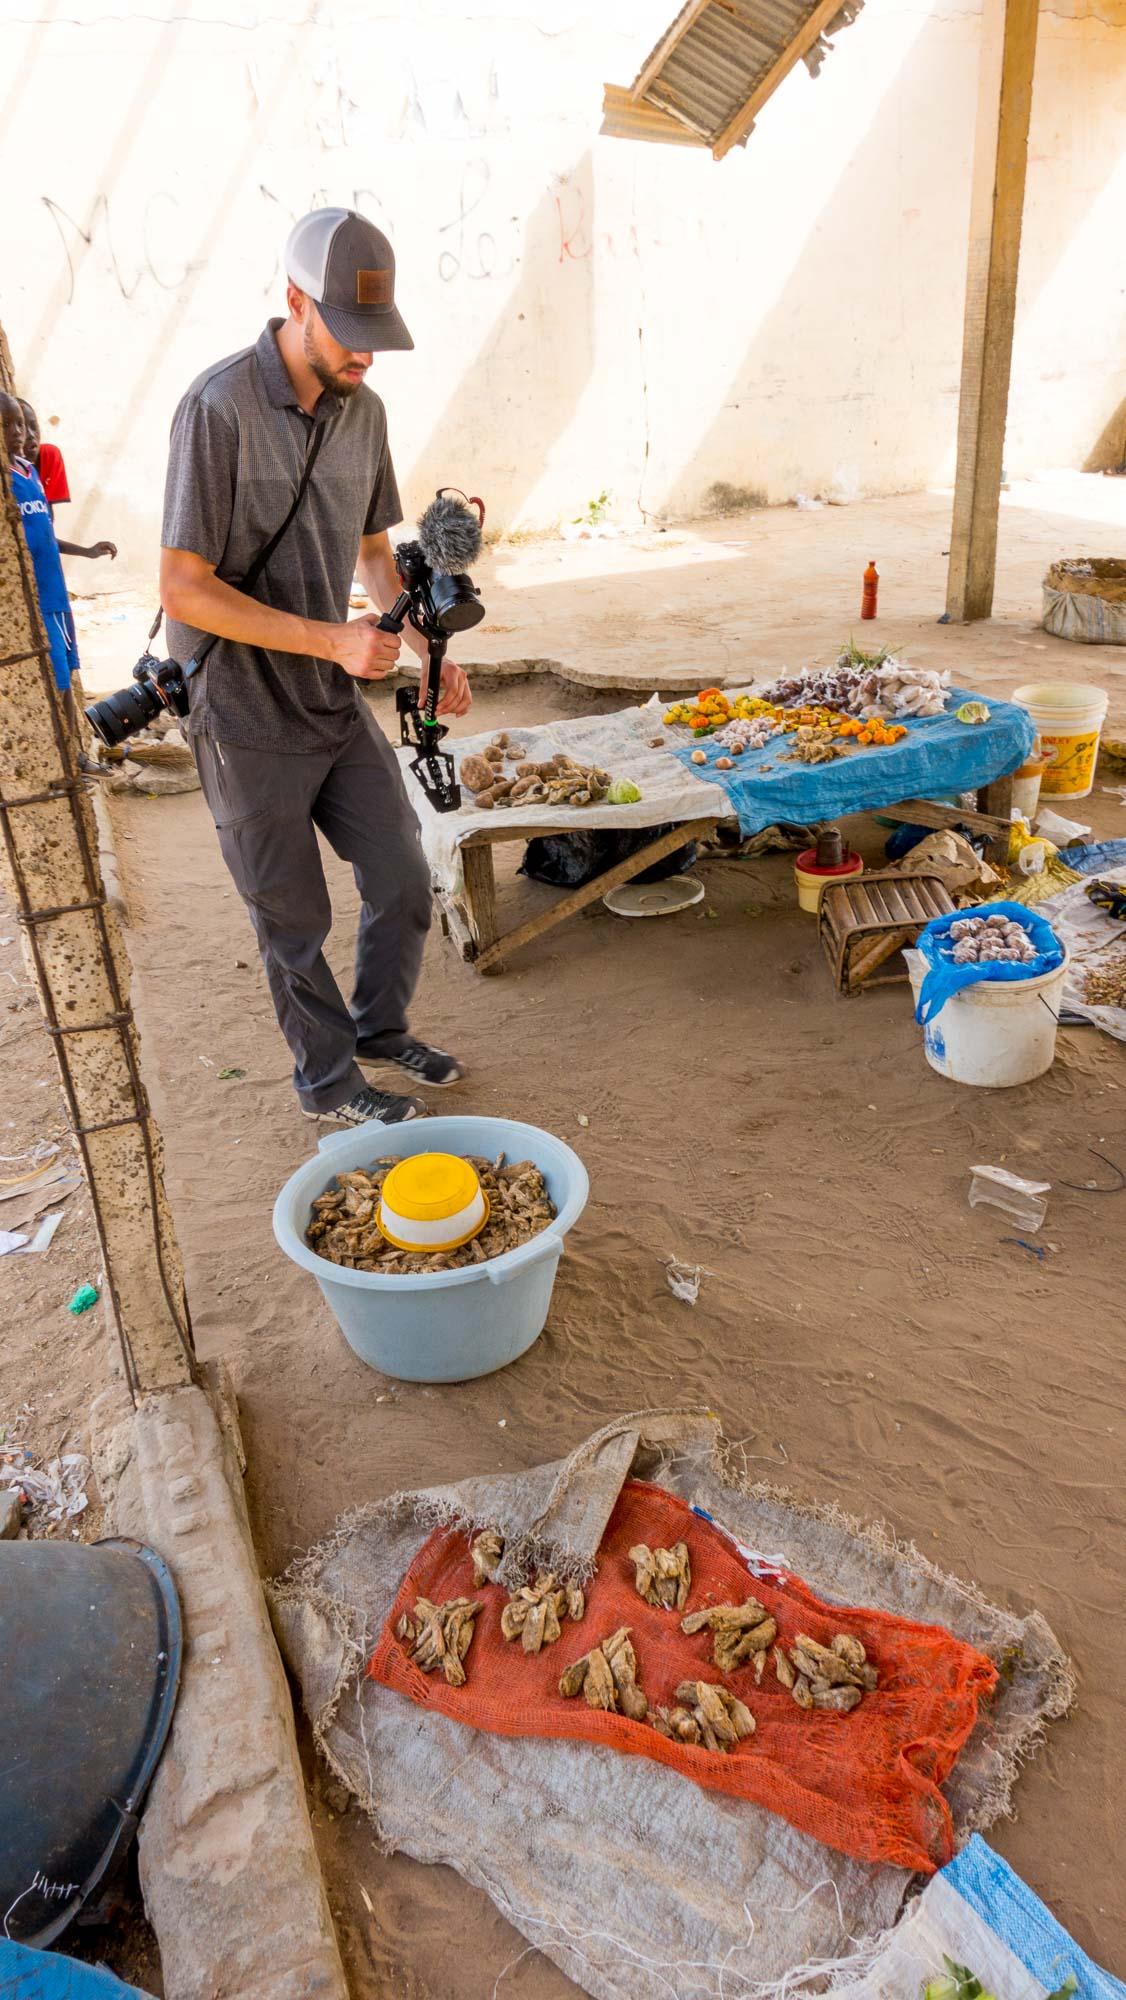 fish market behind the scenes